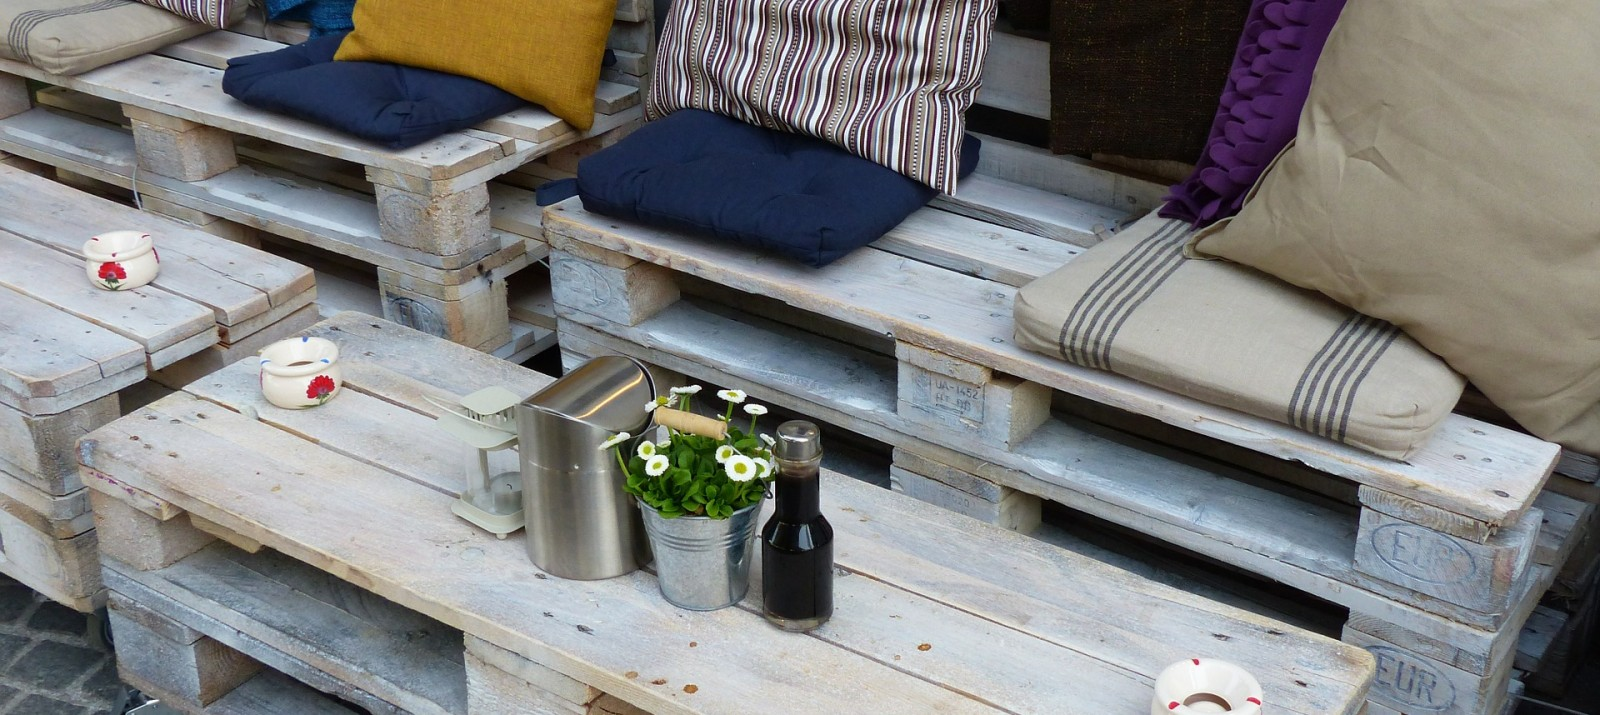 11 diy wood pallet ideas to make space